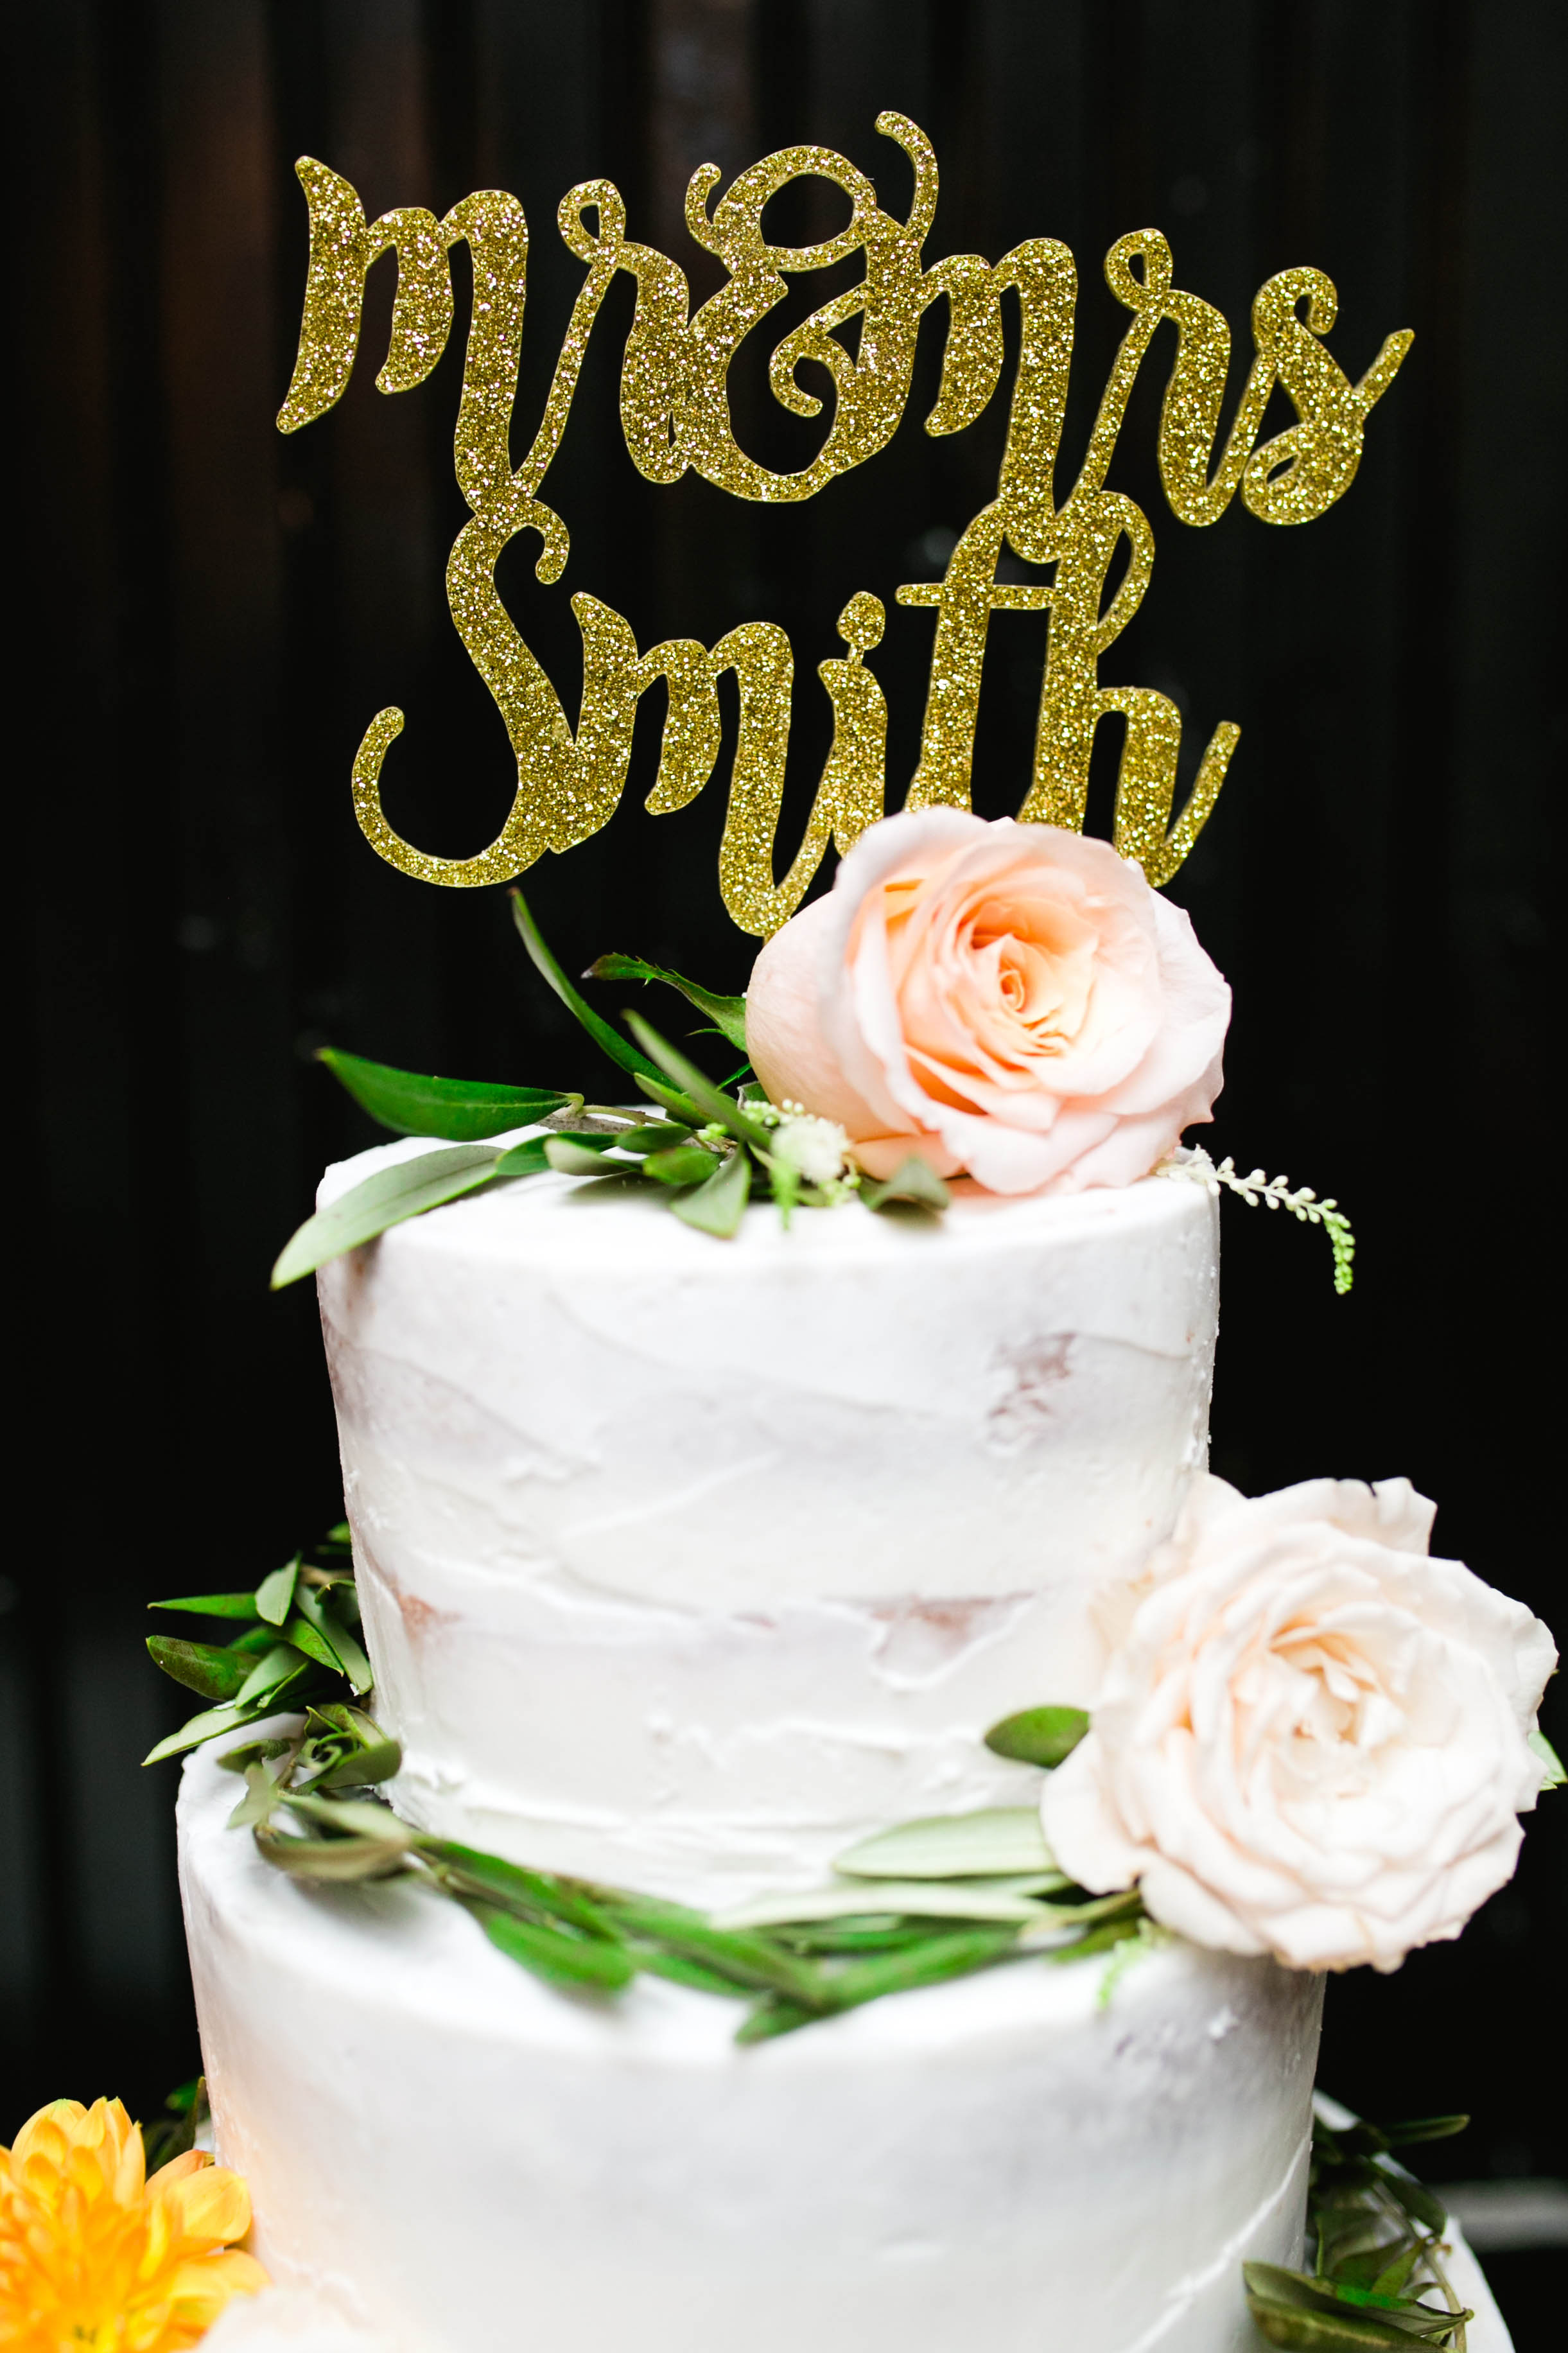 CW Designs Cake Topper